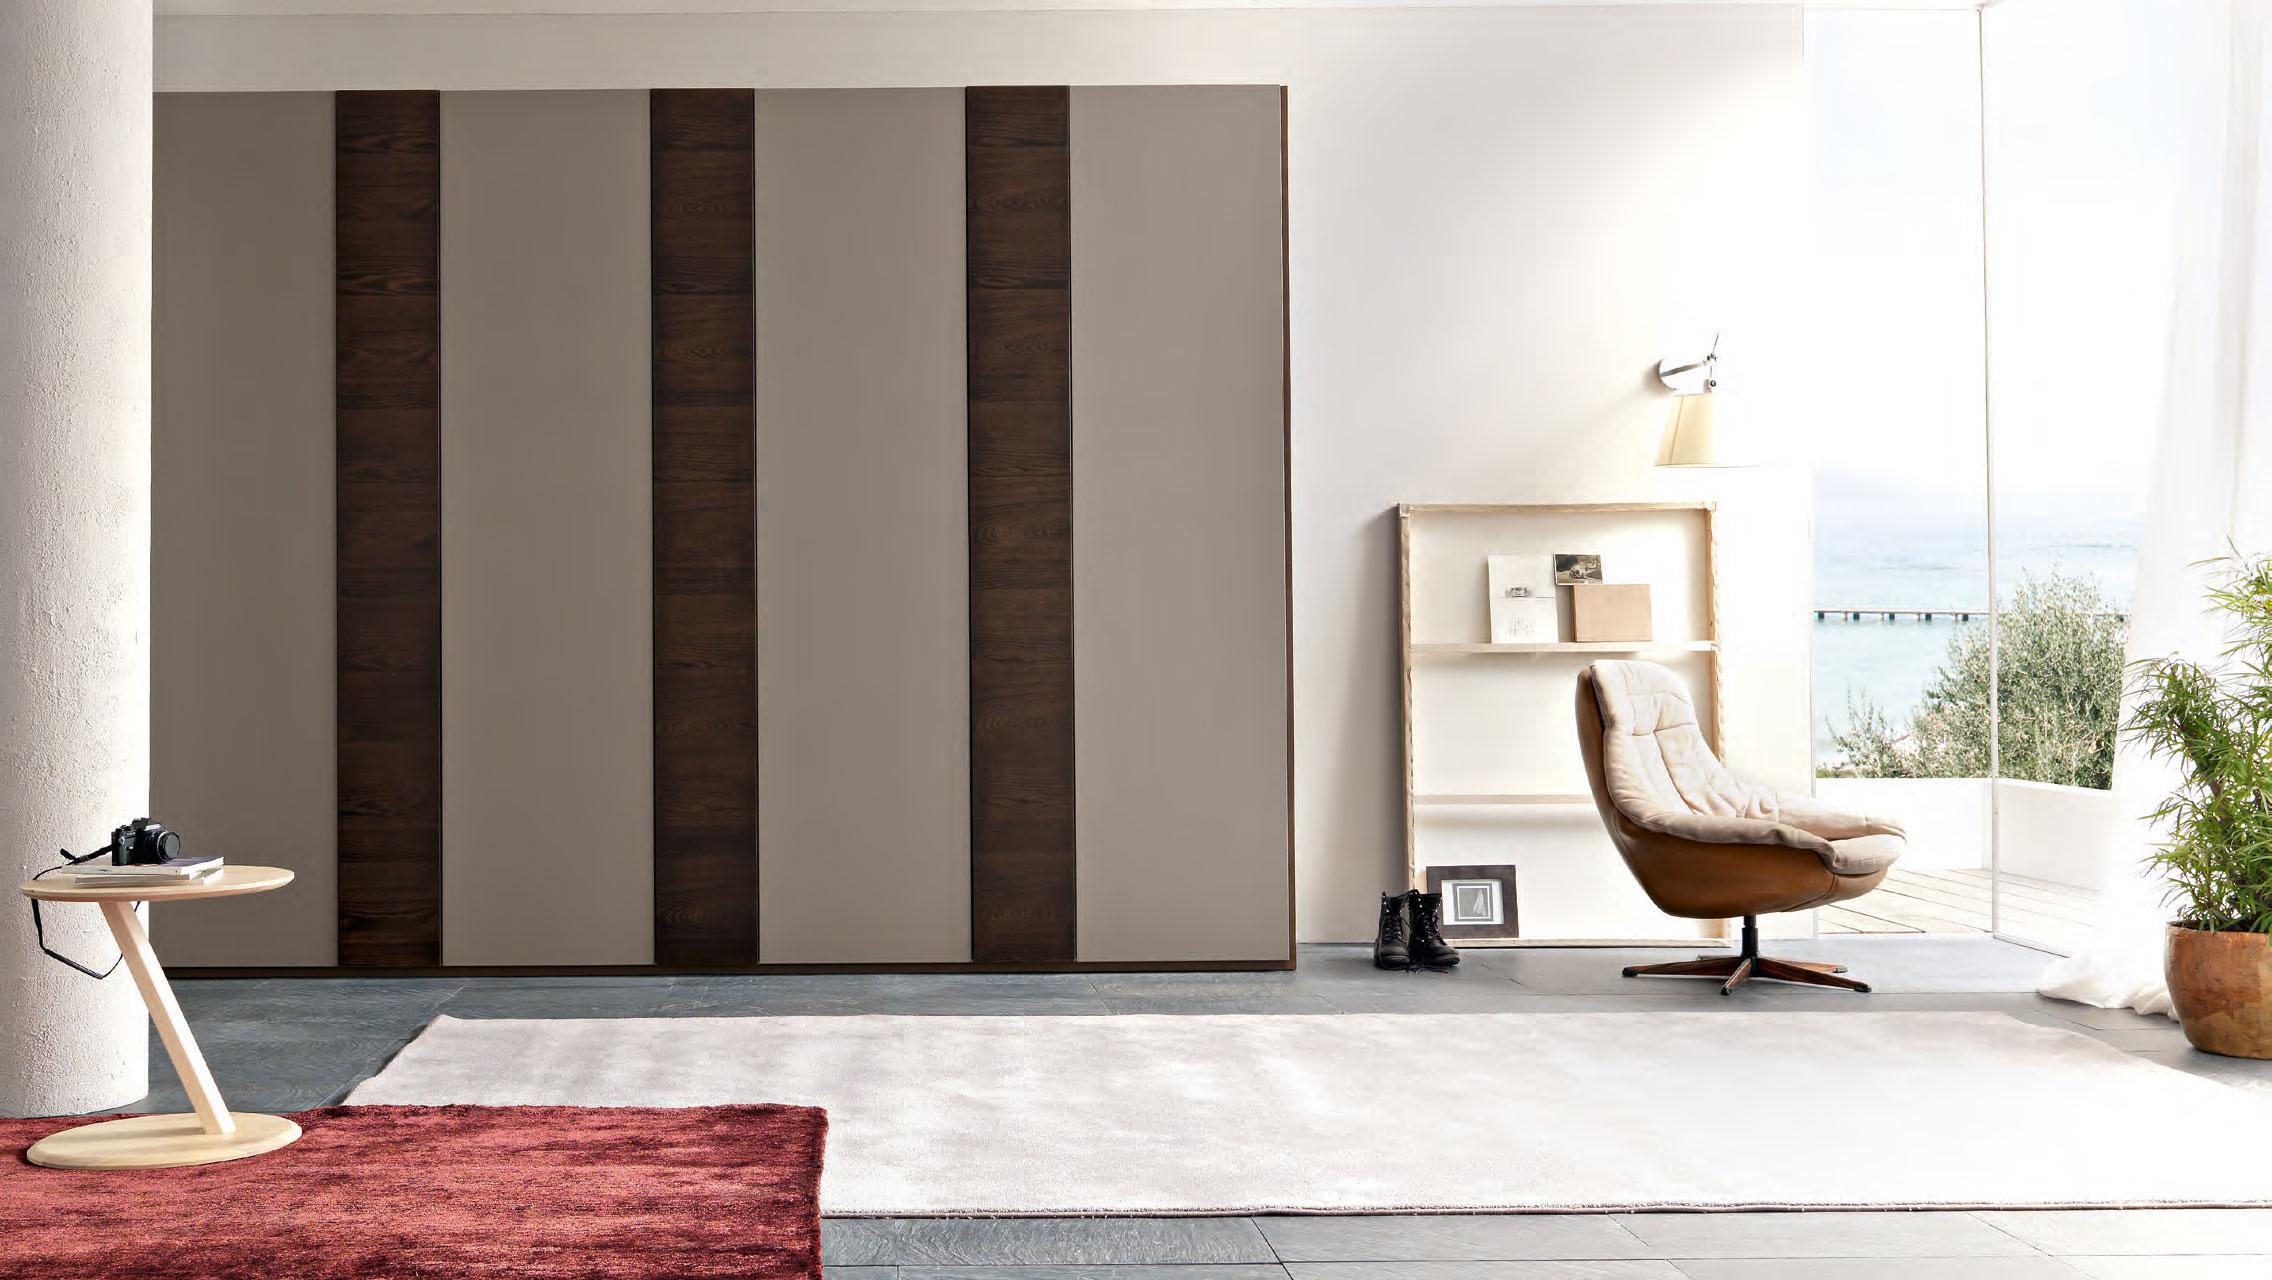 vertical sma modern bedroom wardrobes italy collections - vertical collections sma modern bedroom wardrobes